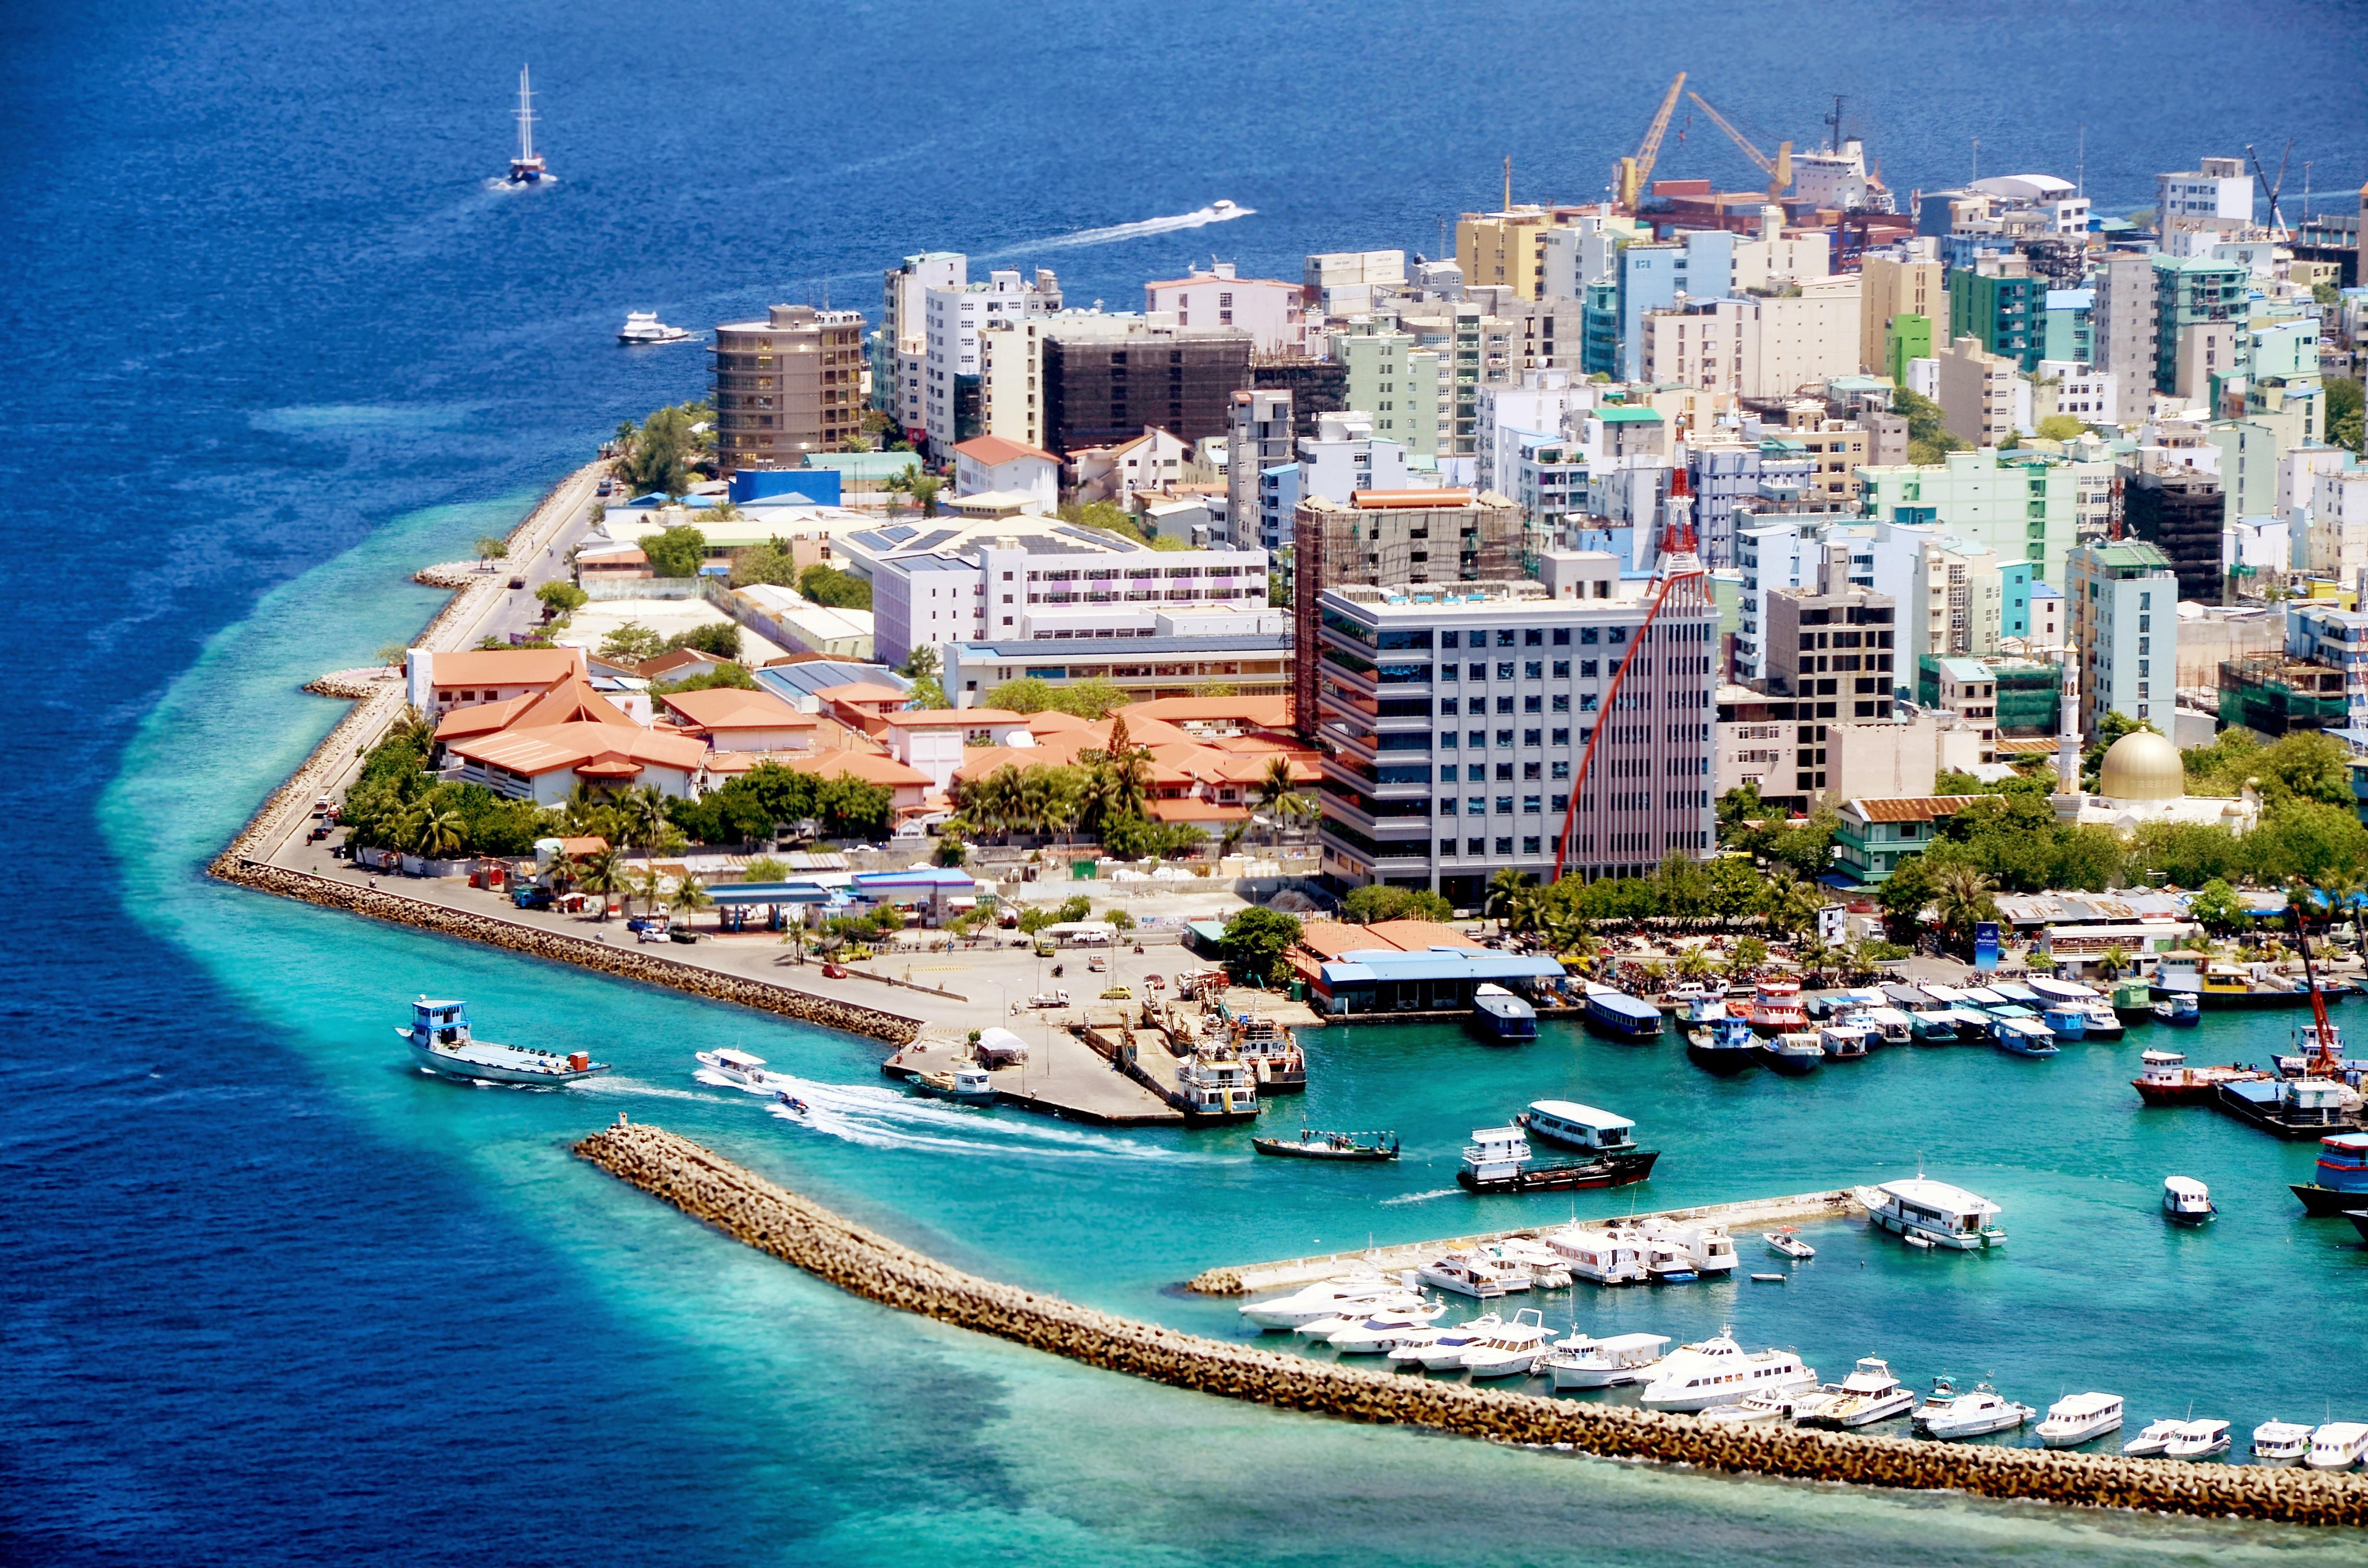 Maldives City Tour